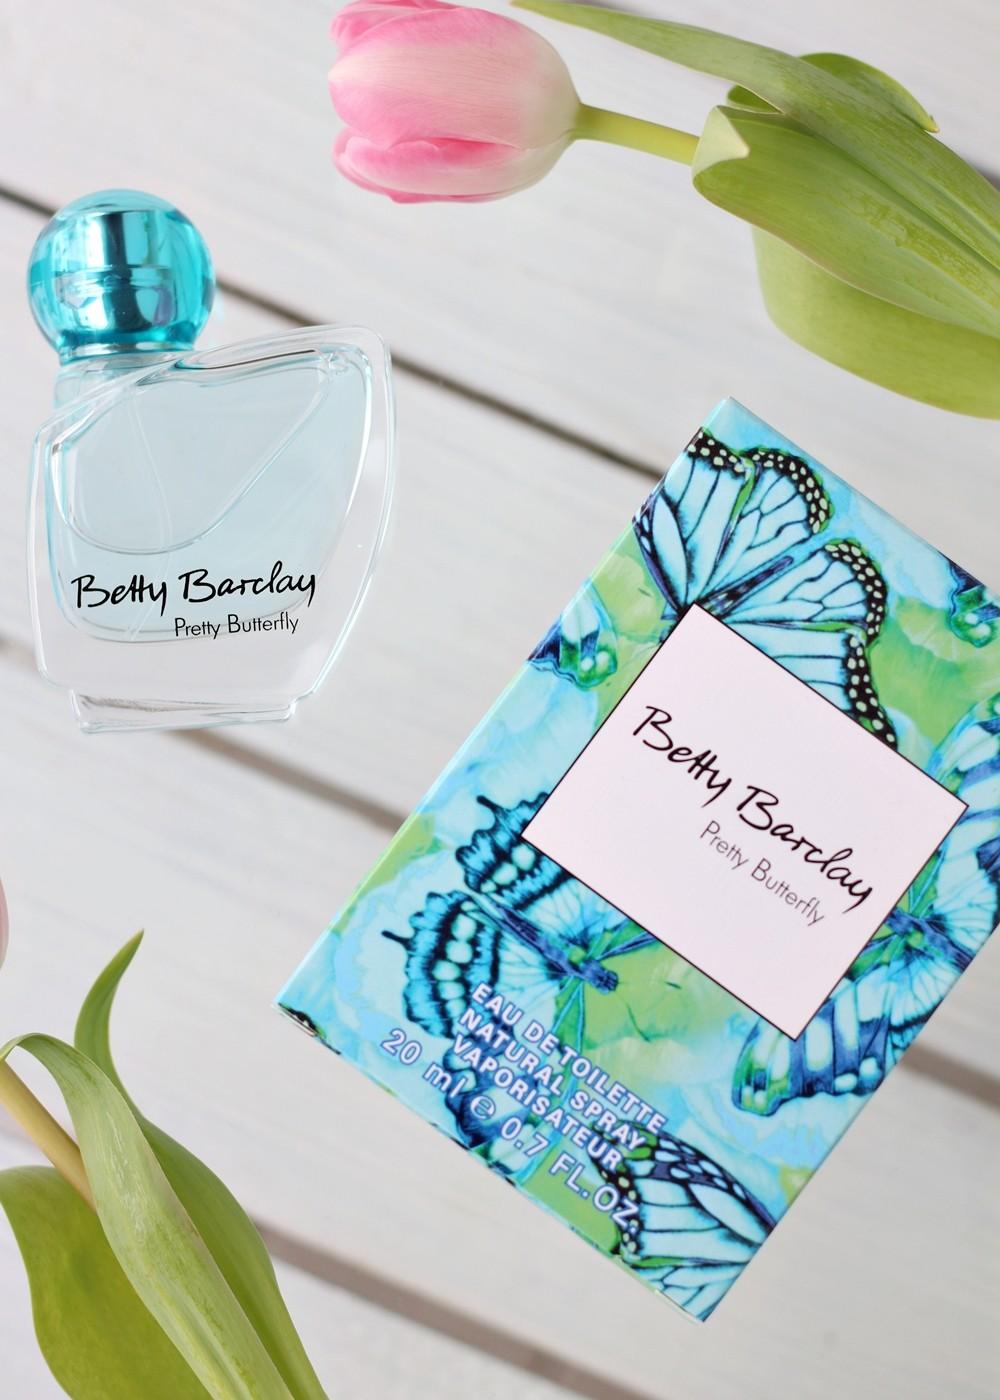 Betty Barclay Pretty Butterfly Parfum